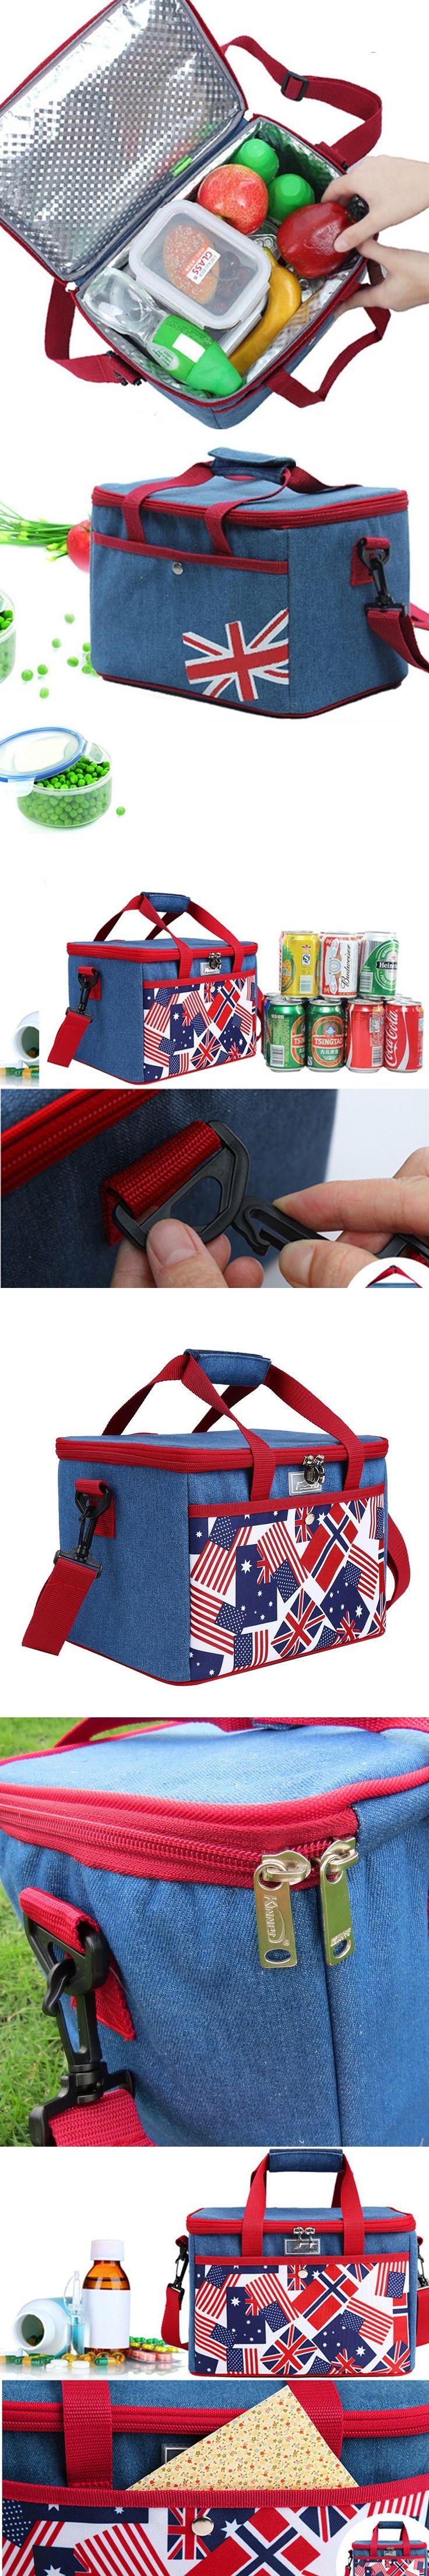 2015 Hot canvas Picnic Basket Zip Travel shoulder Cooler Bag ice lunch bags lunch cooler bag picnic bag free shipping